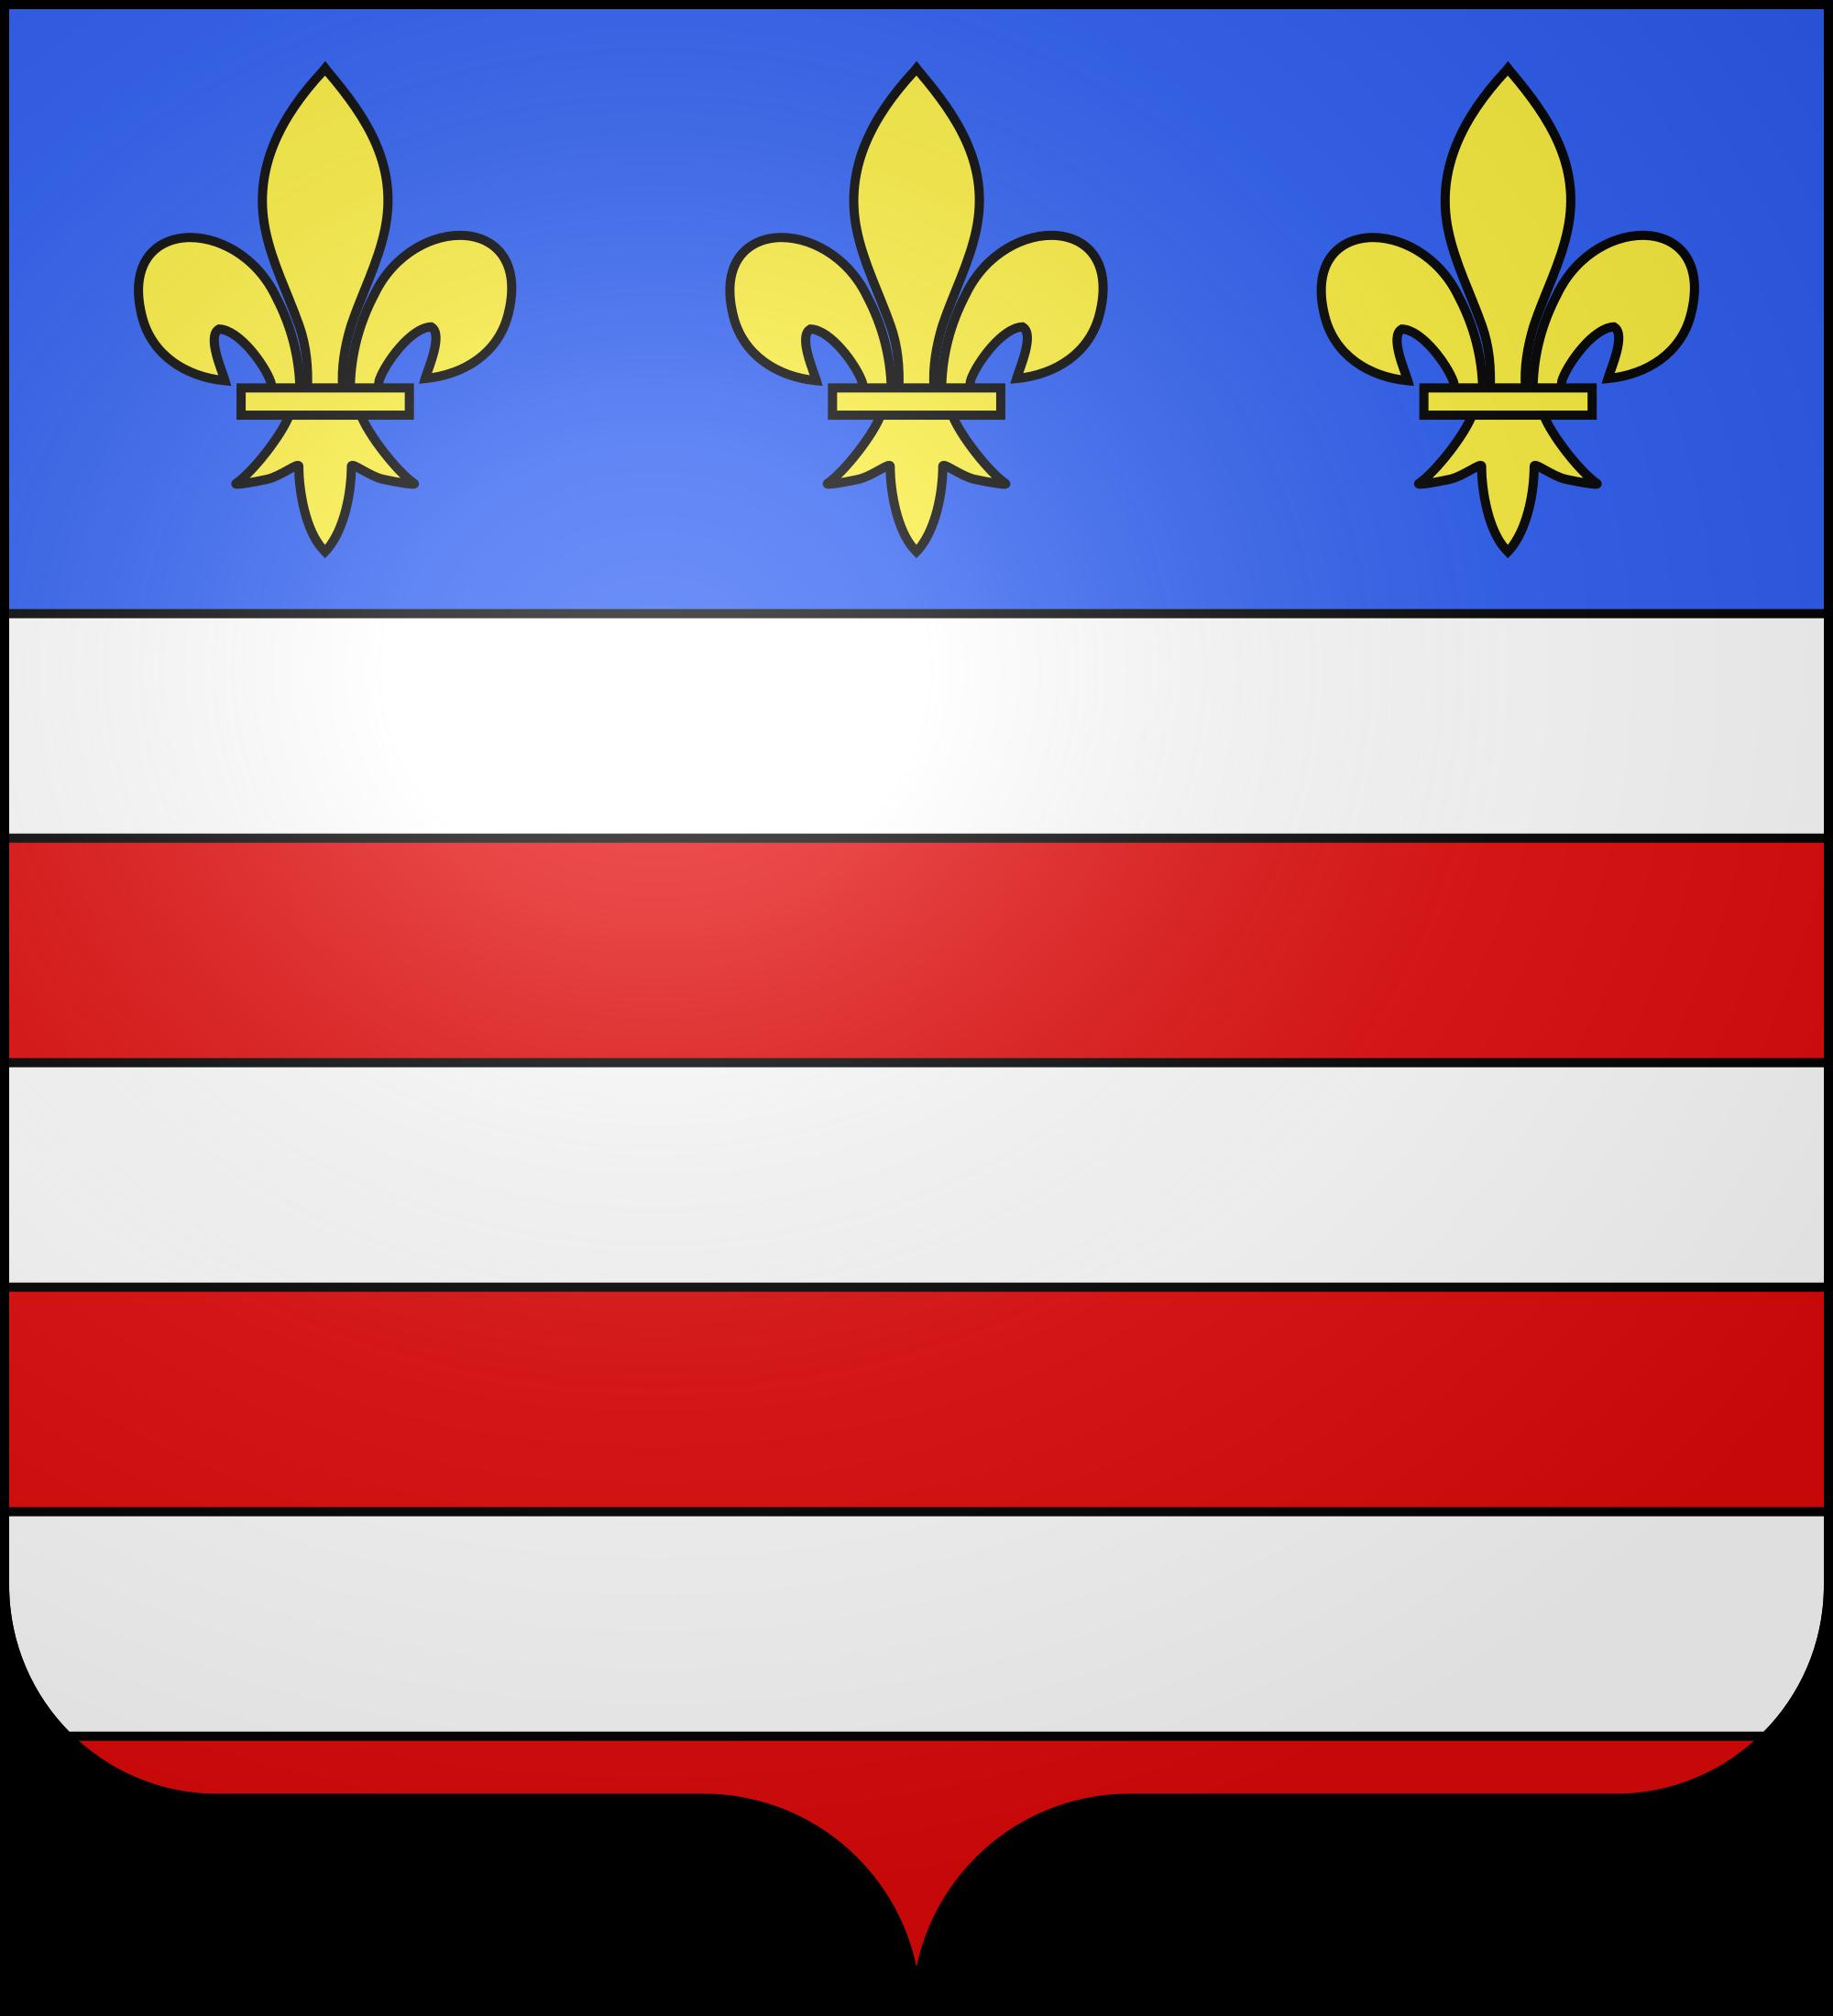 File:Blason d'Uzès.svg.